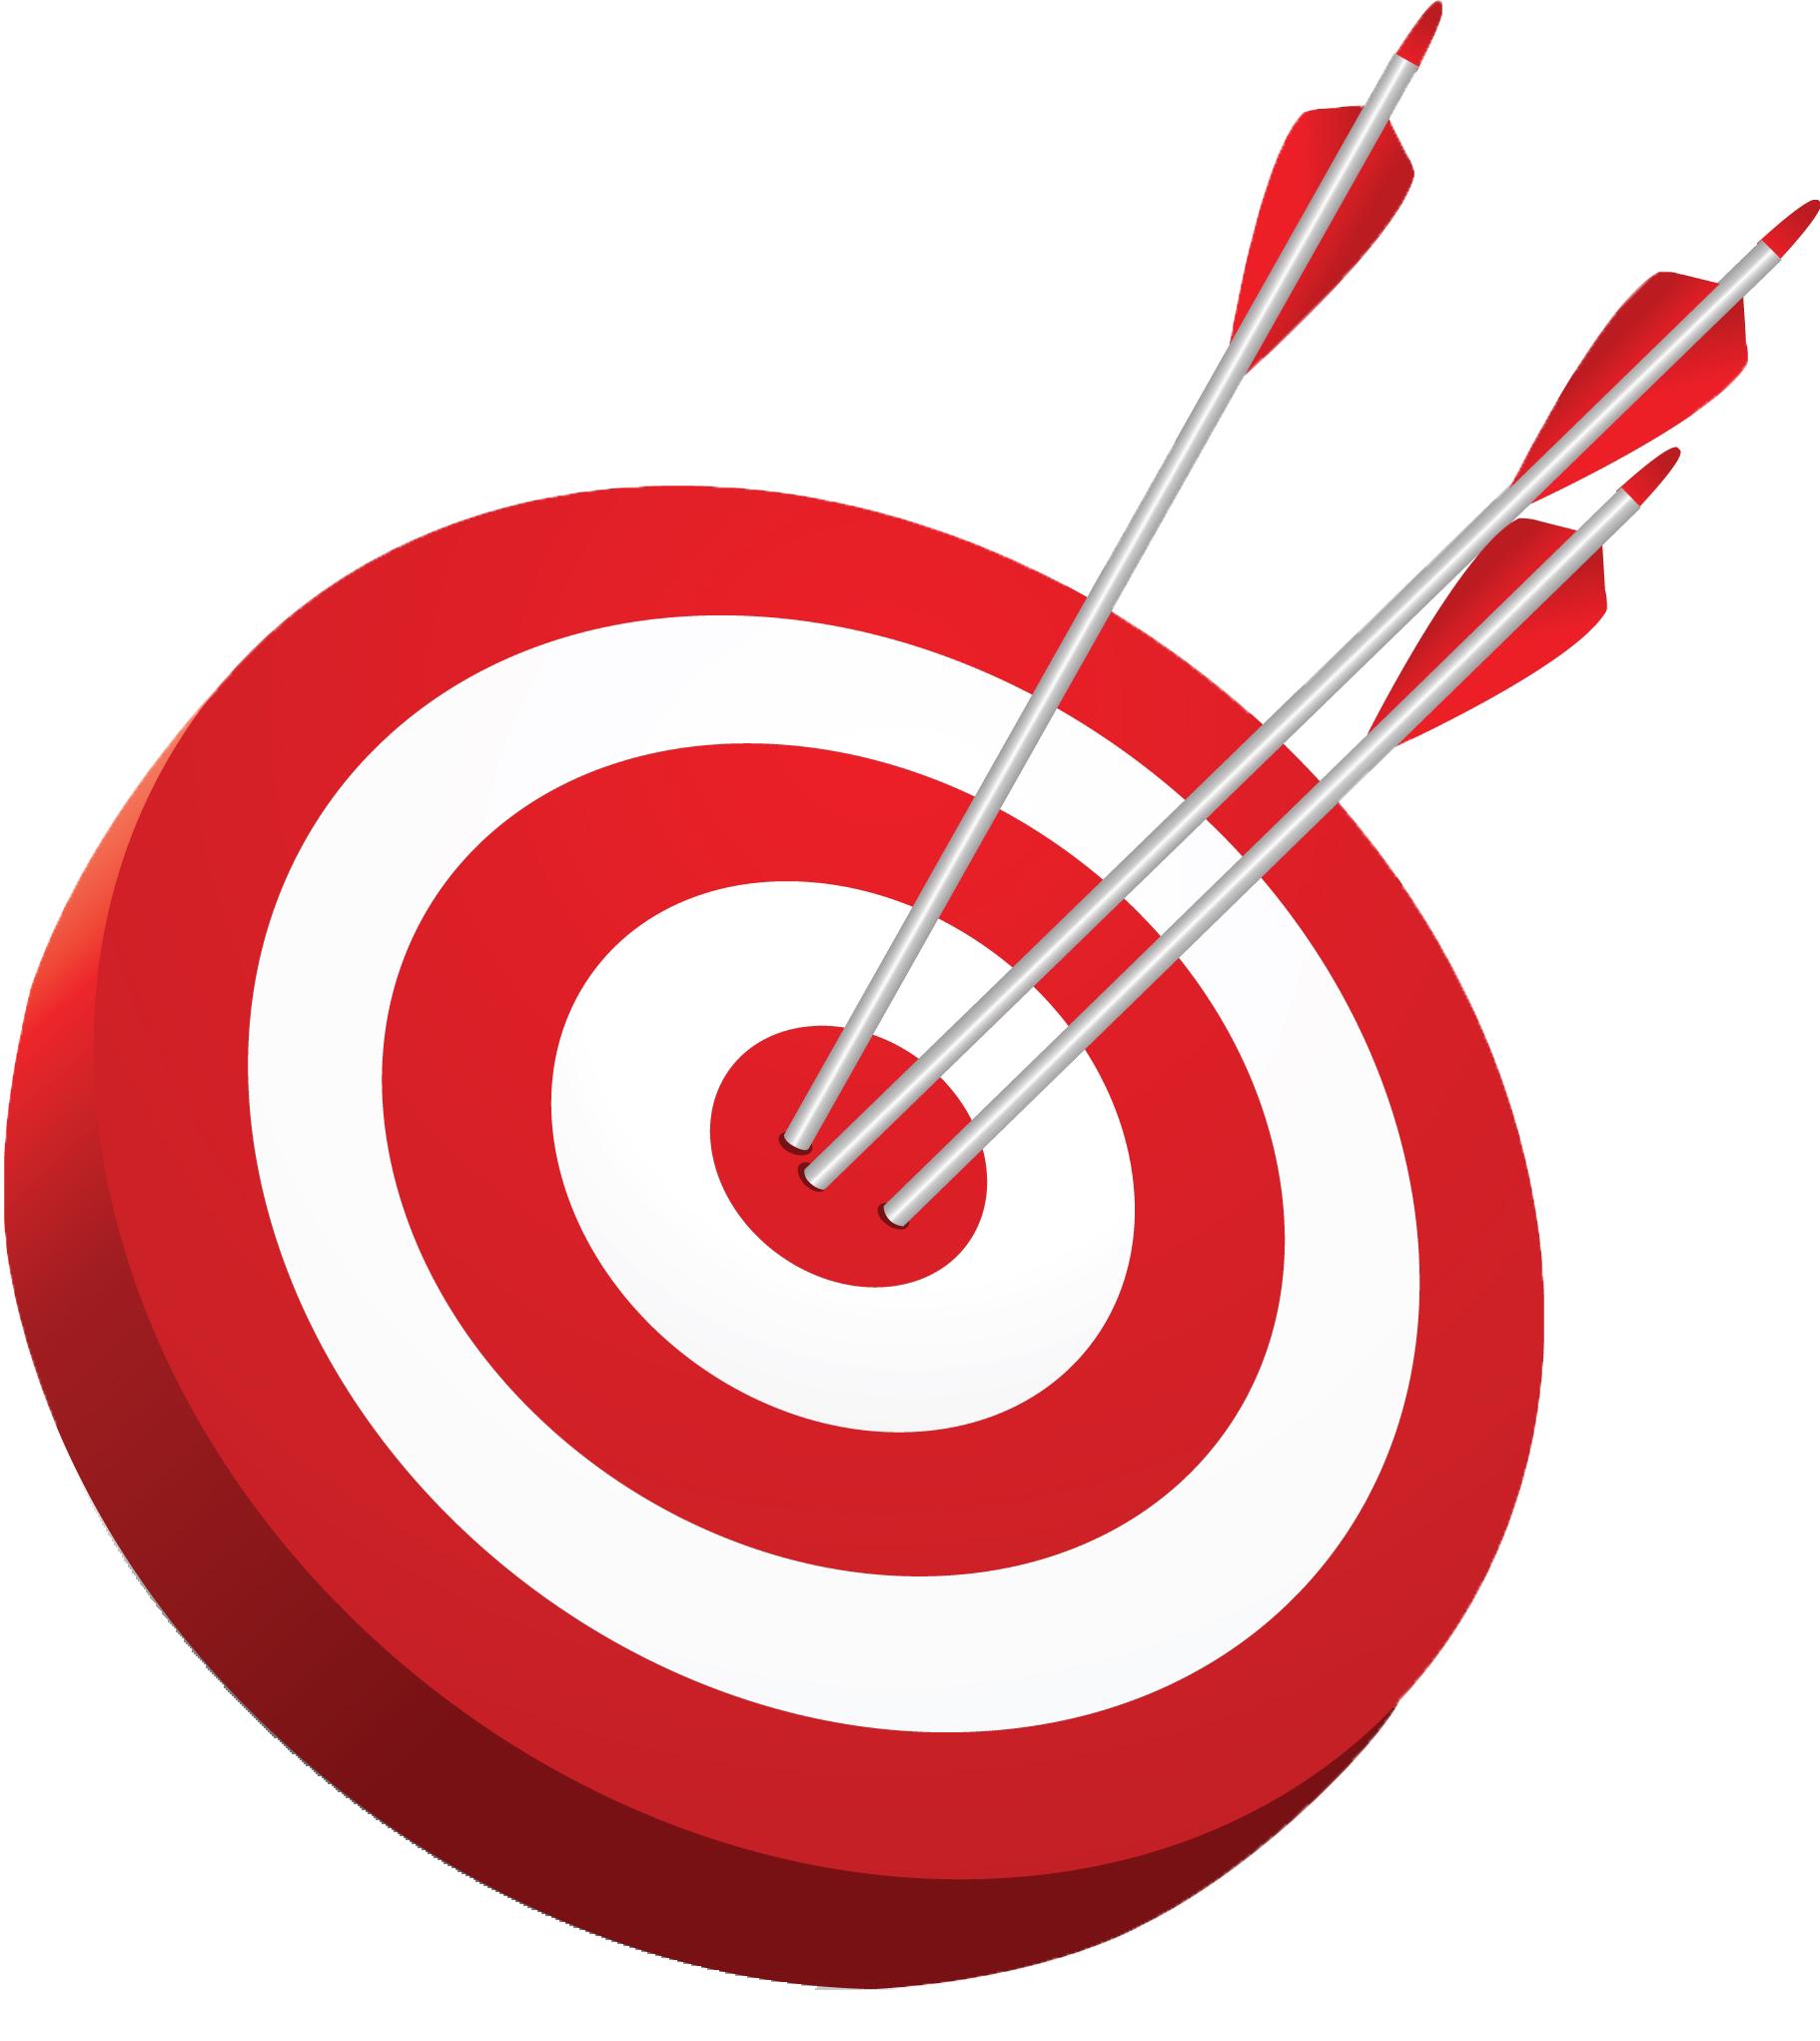 Missions clipart board target. Our team hopeforjavier